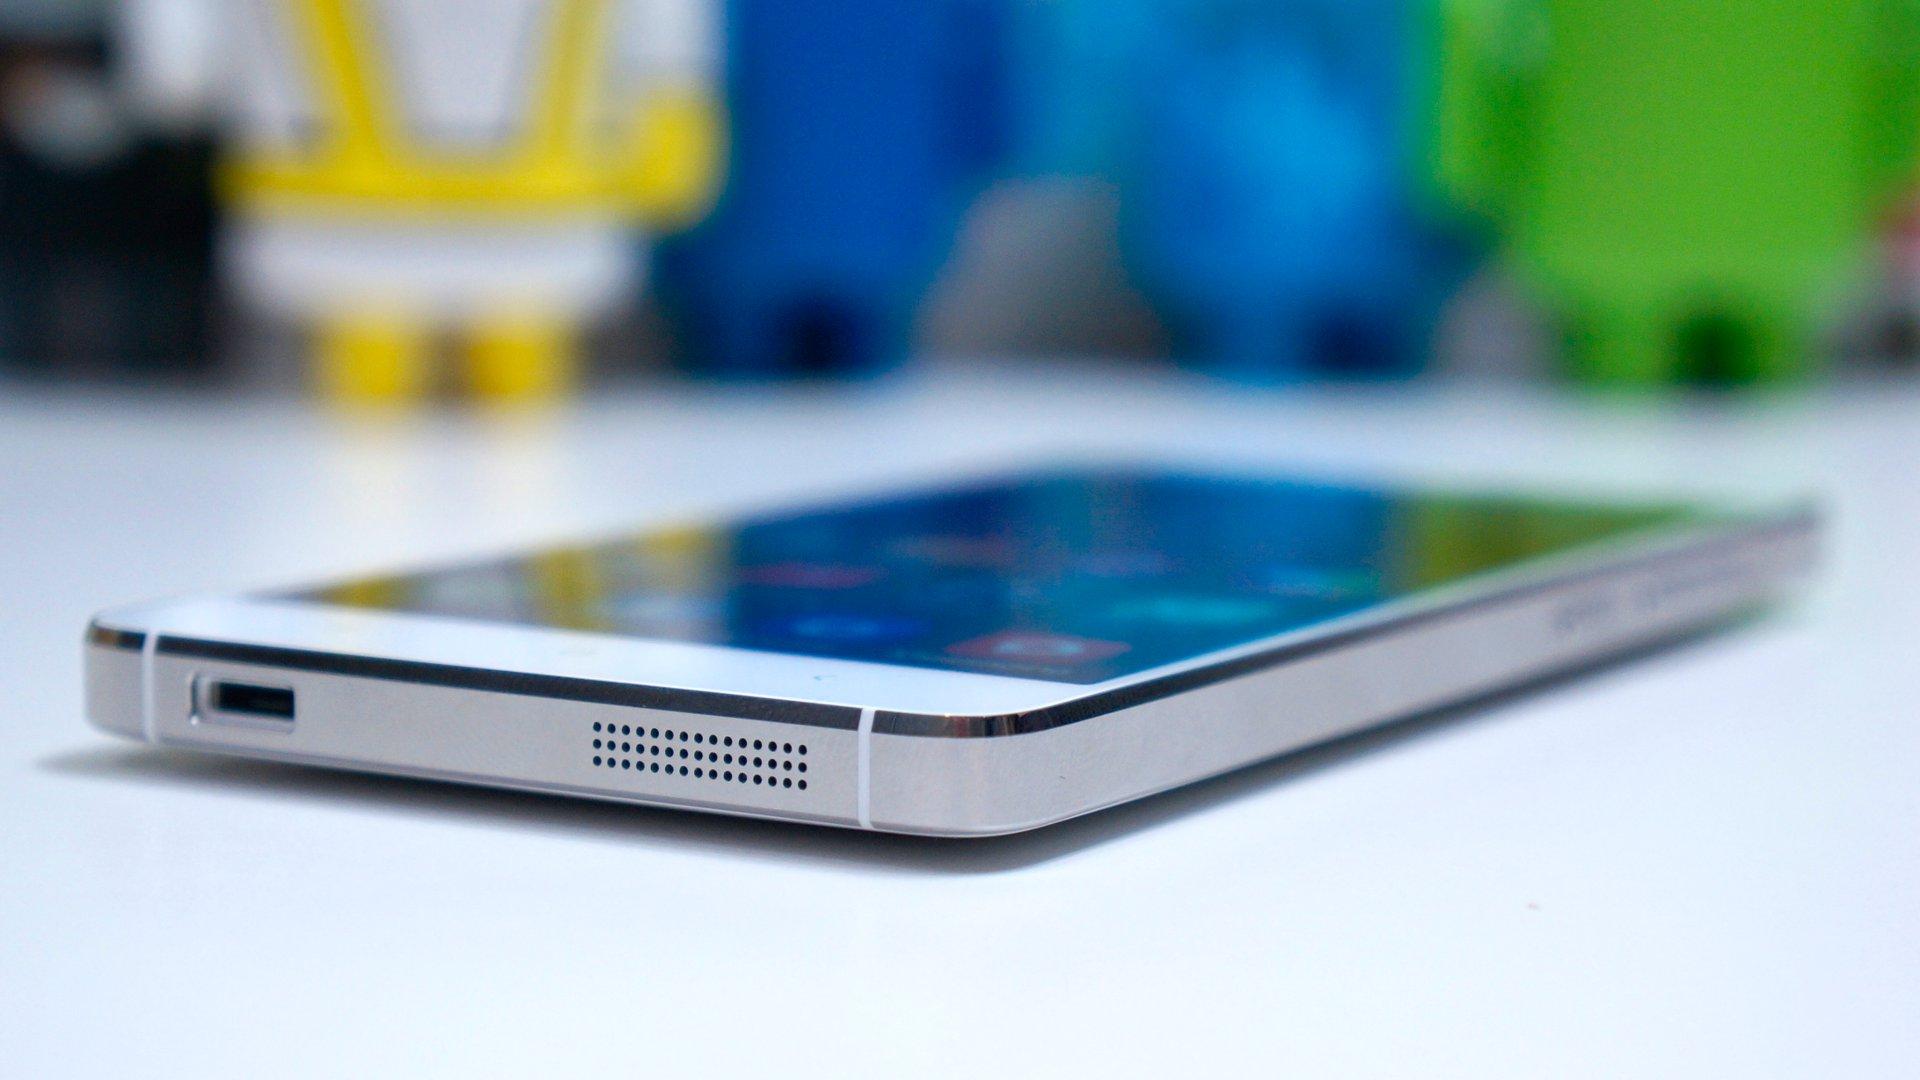 Xiaomi Mi5 - Stock Image